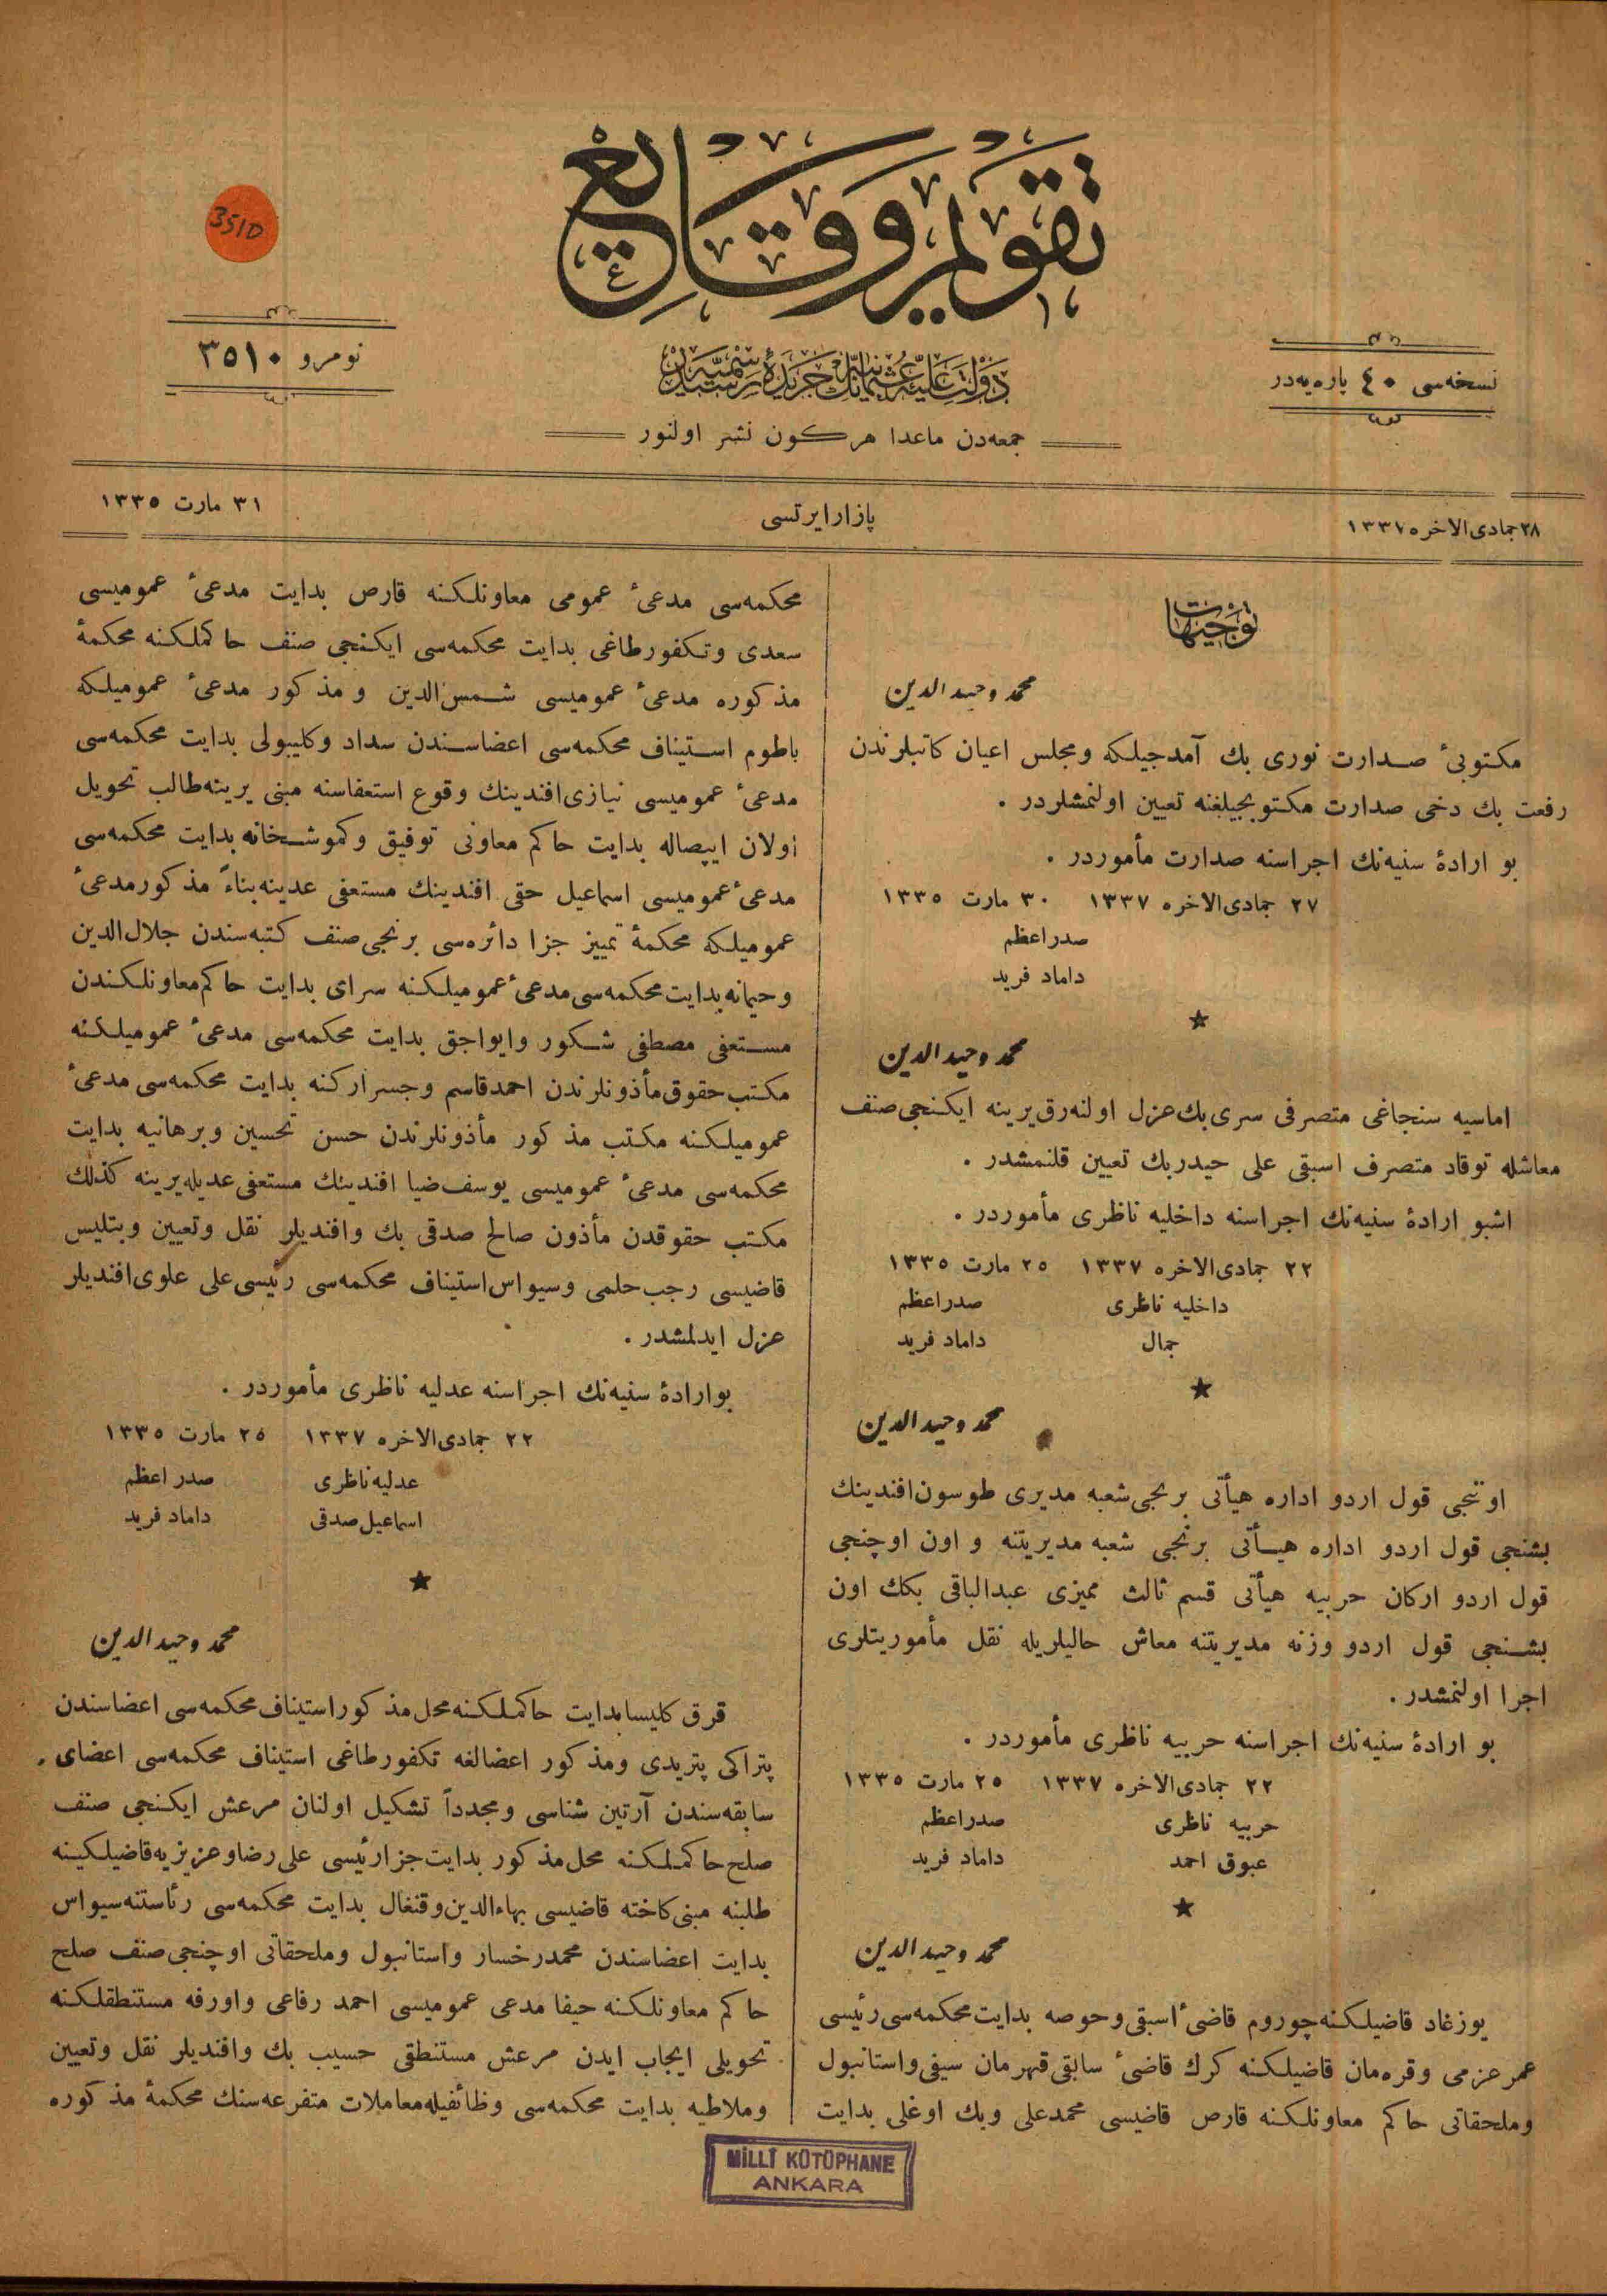 31 Mart 1919 Tarihli Takvim-i Vekayi Gazetesi Sayfa 1